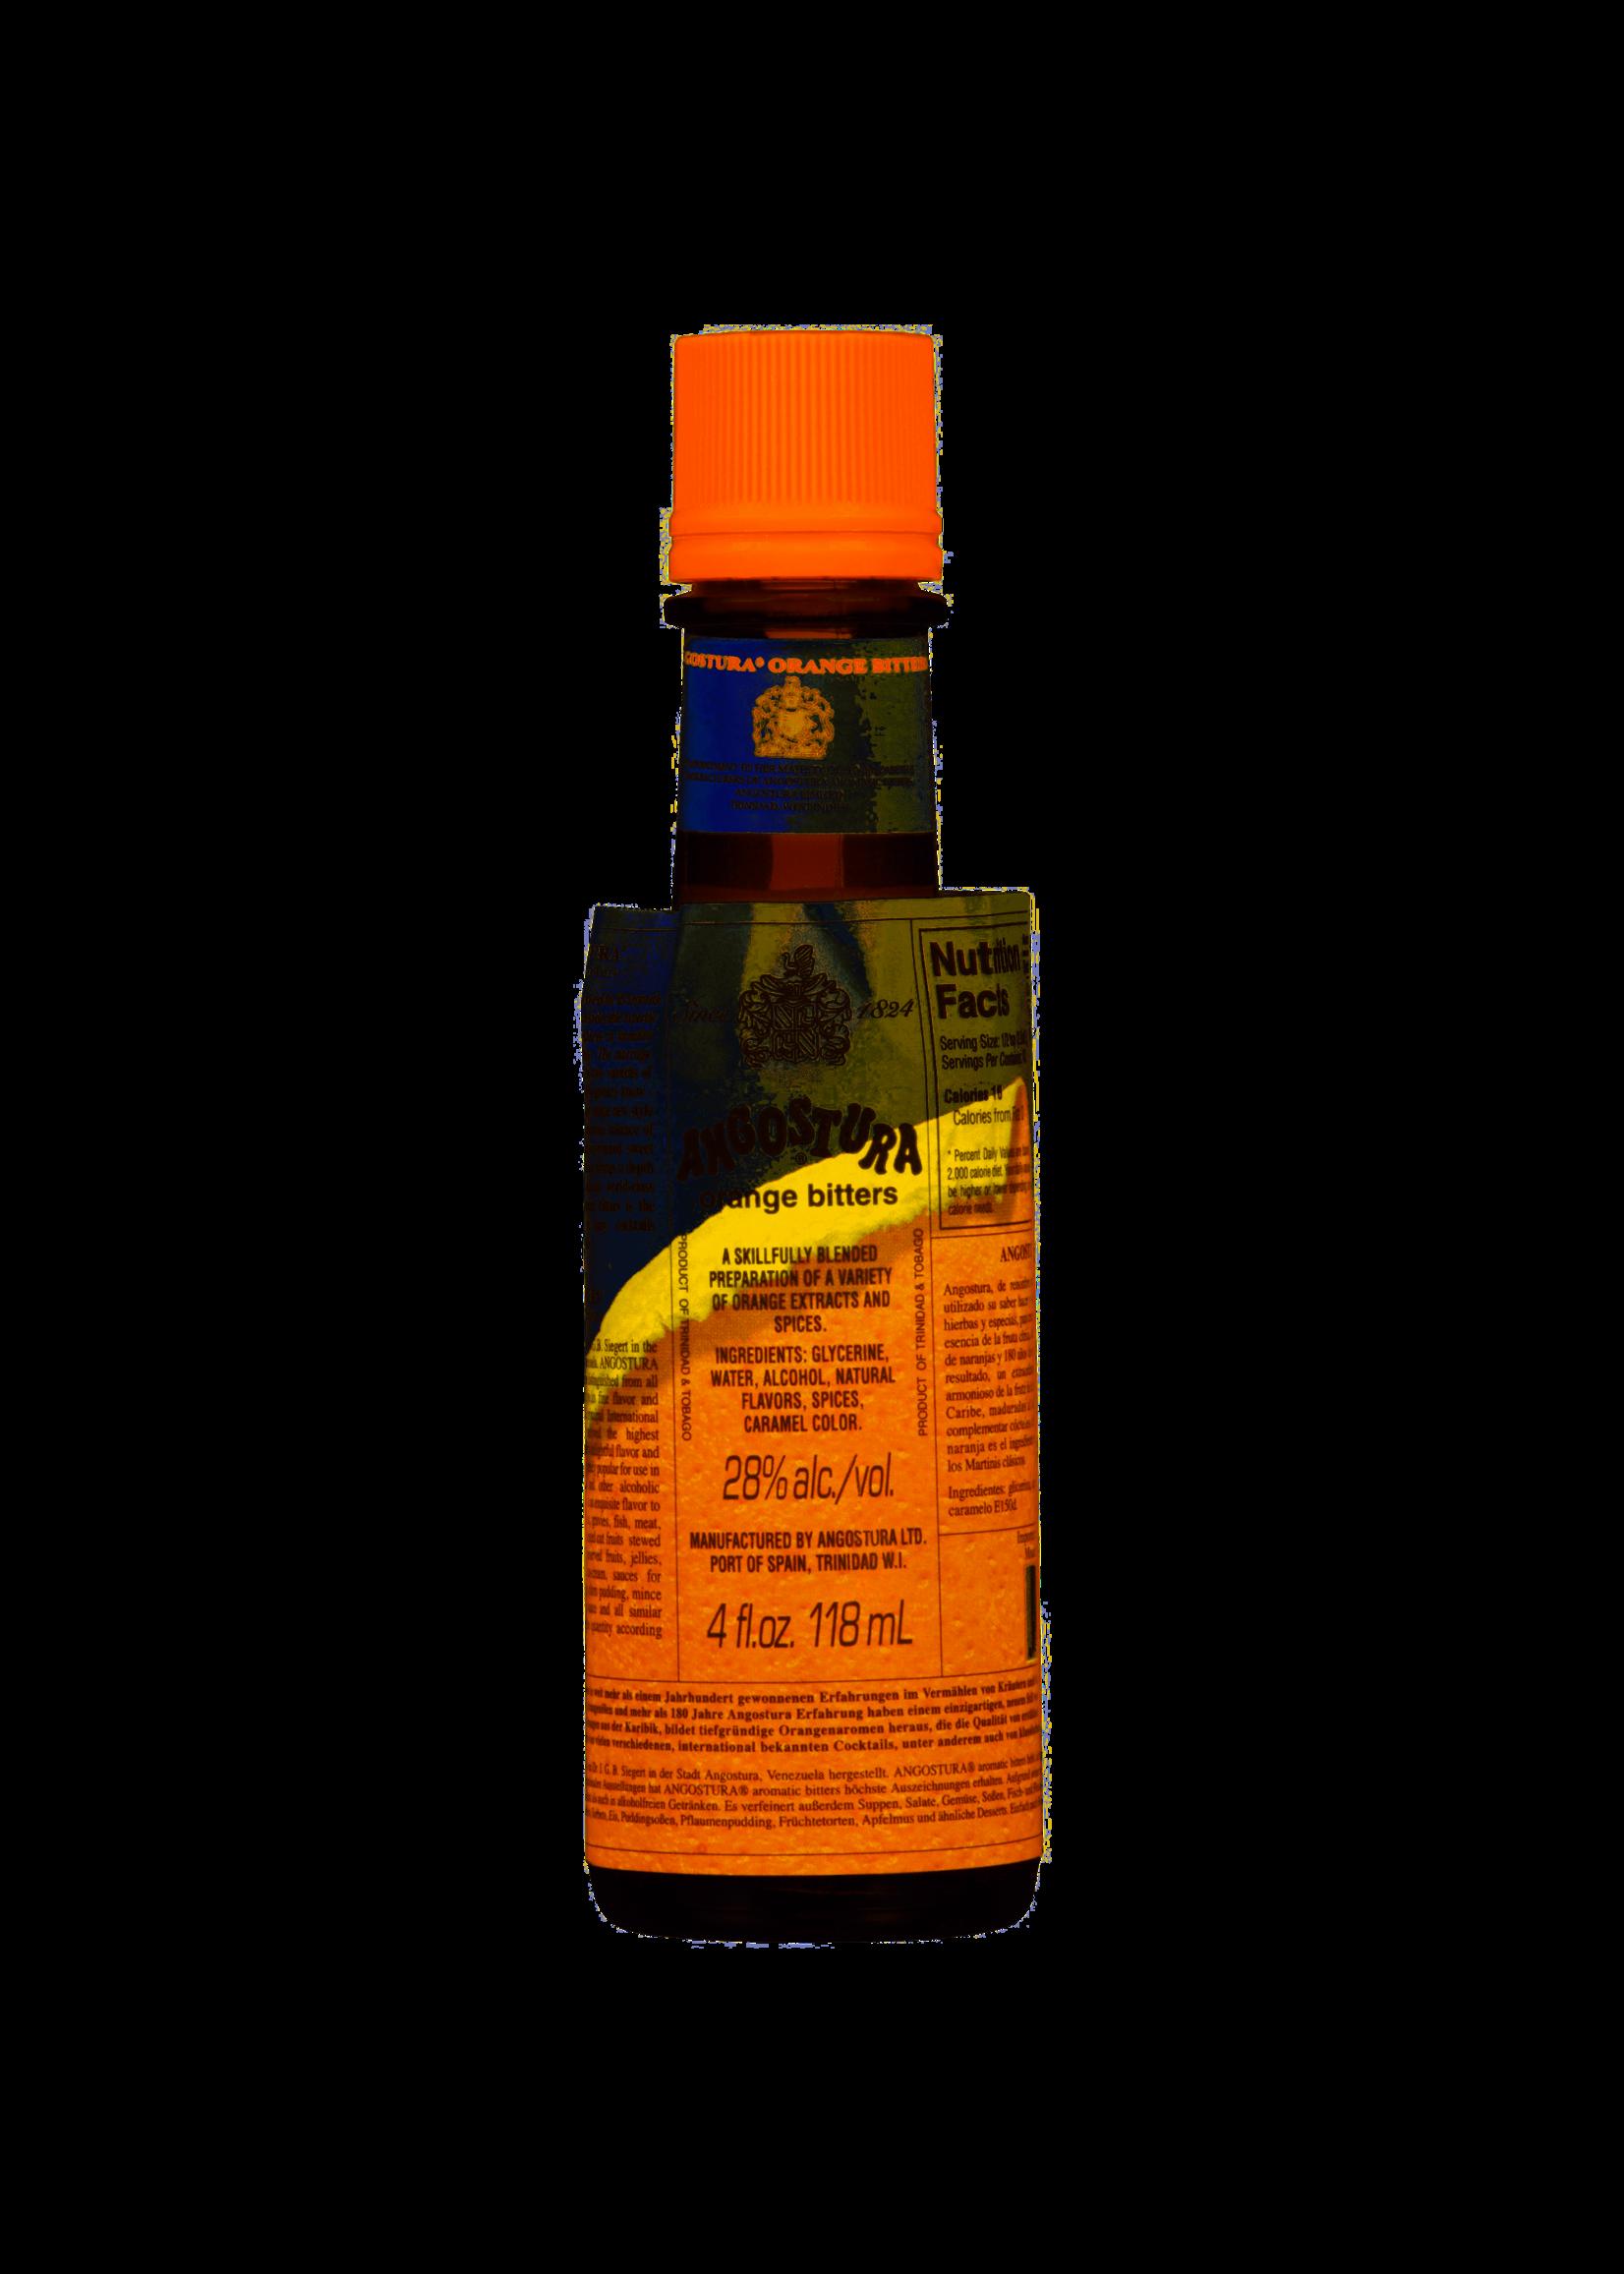 webstaurant Angostura Orange Bitters / 4oz